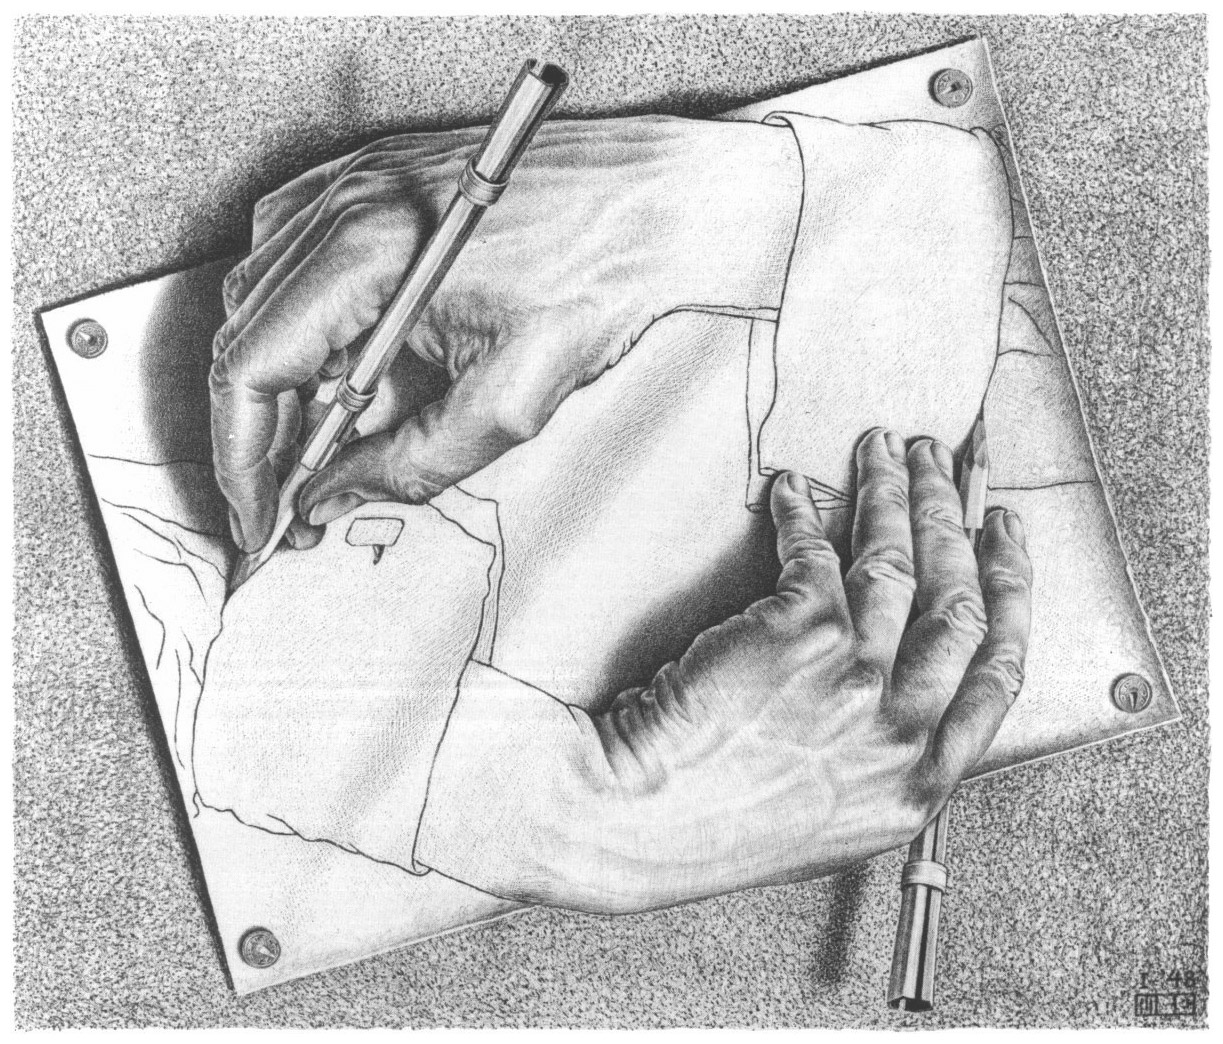 Drawing_hands_escher_cours_de_dessin